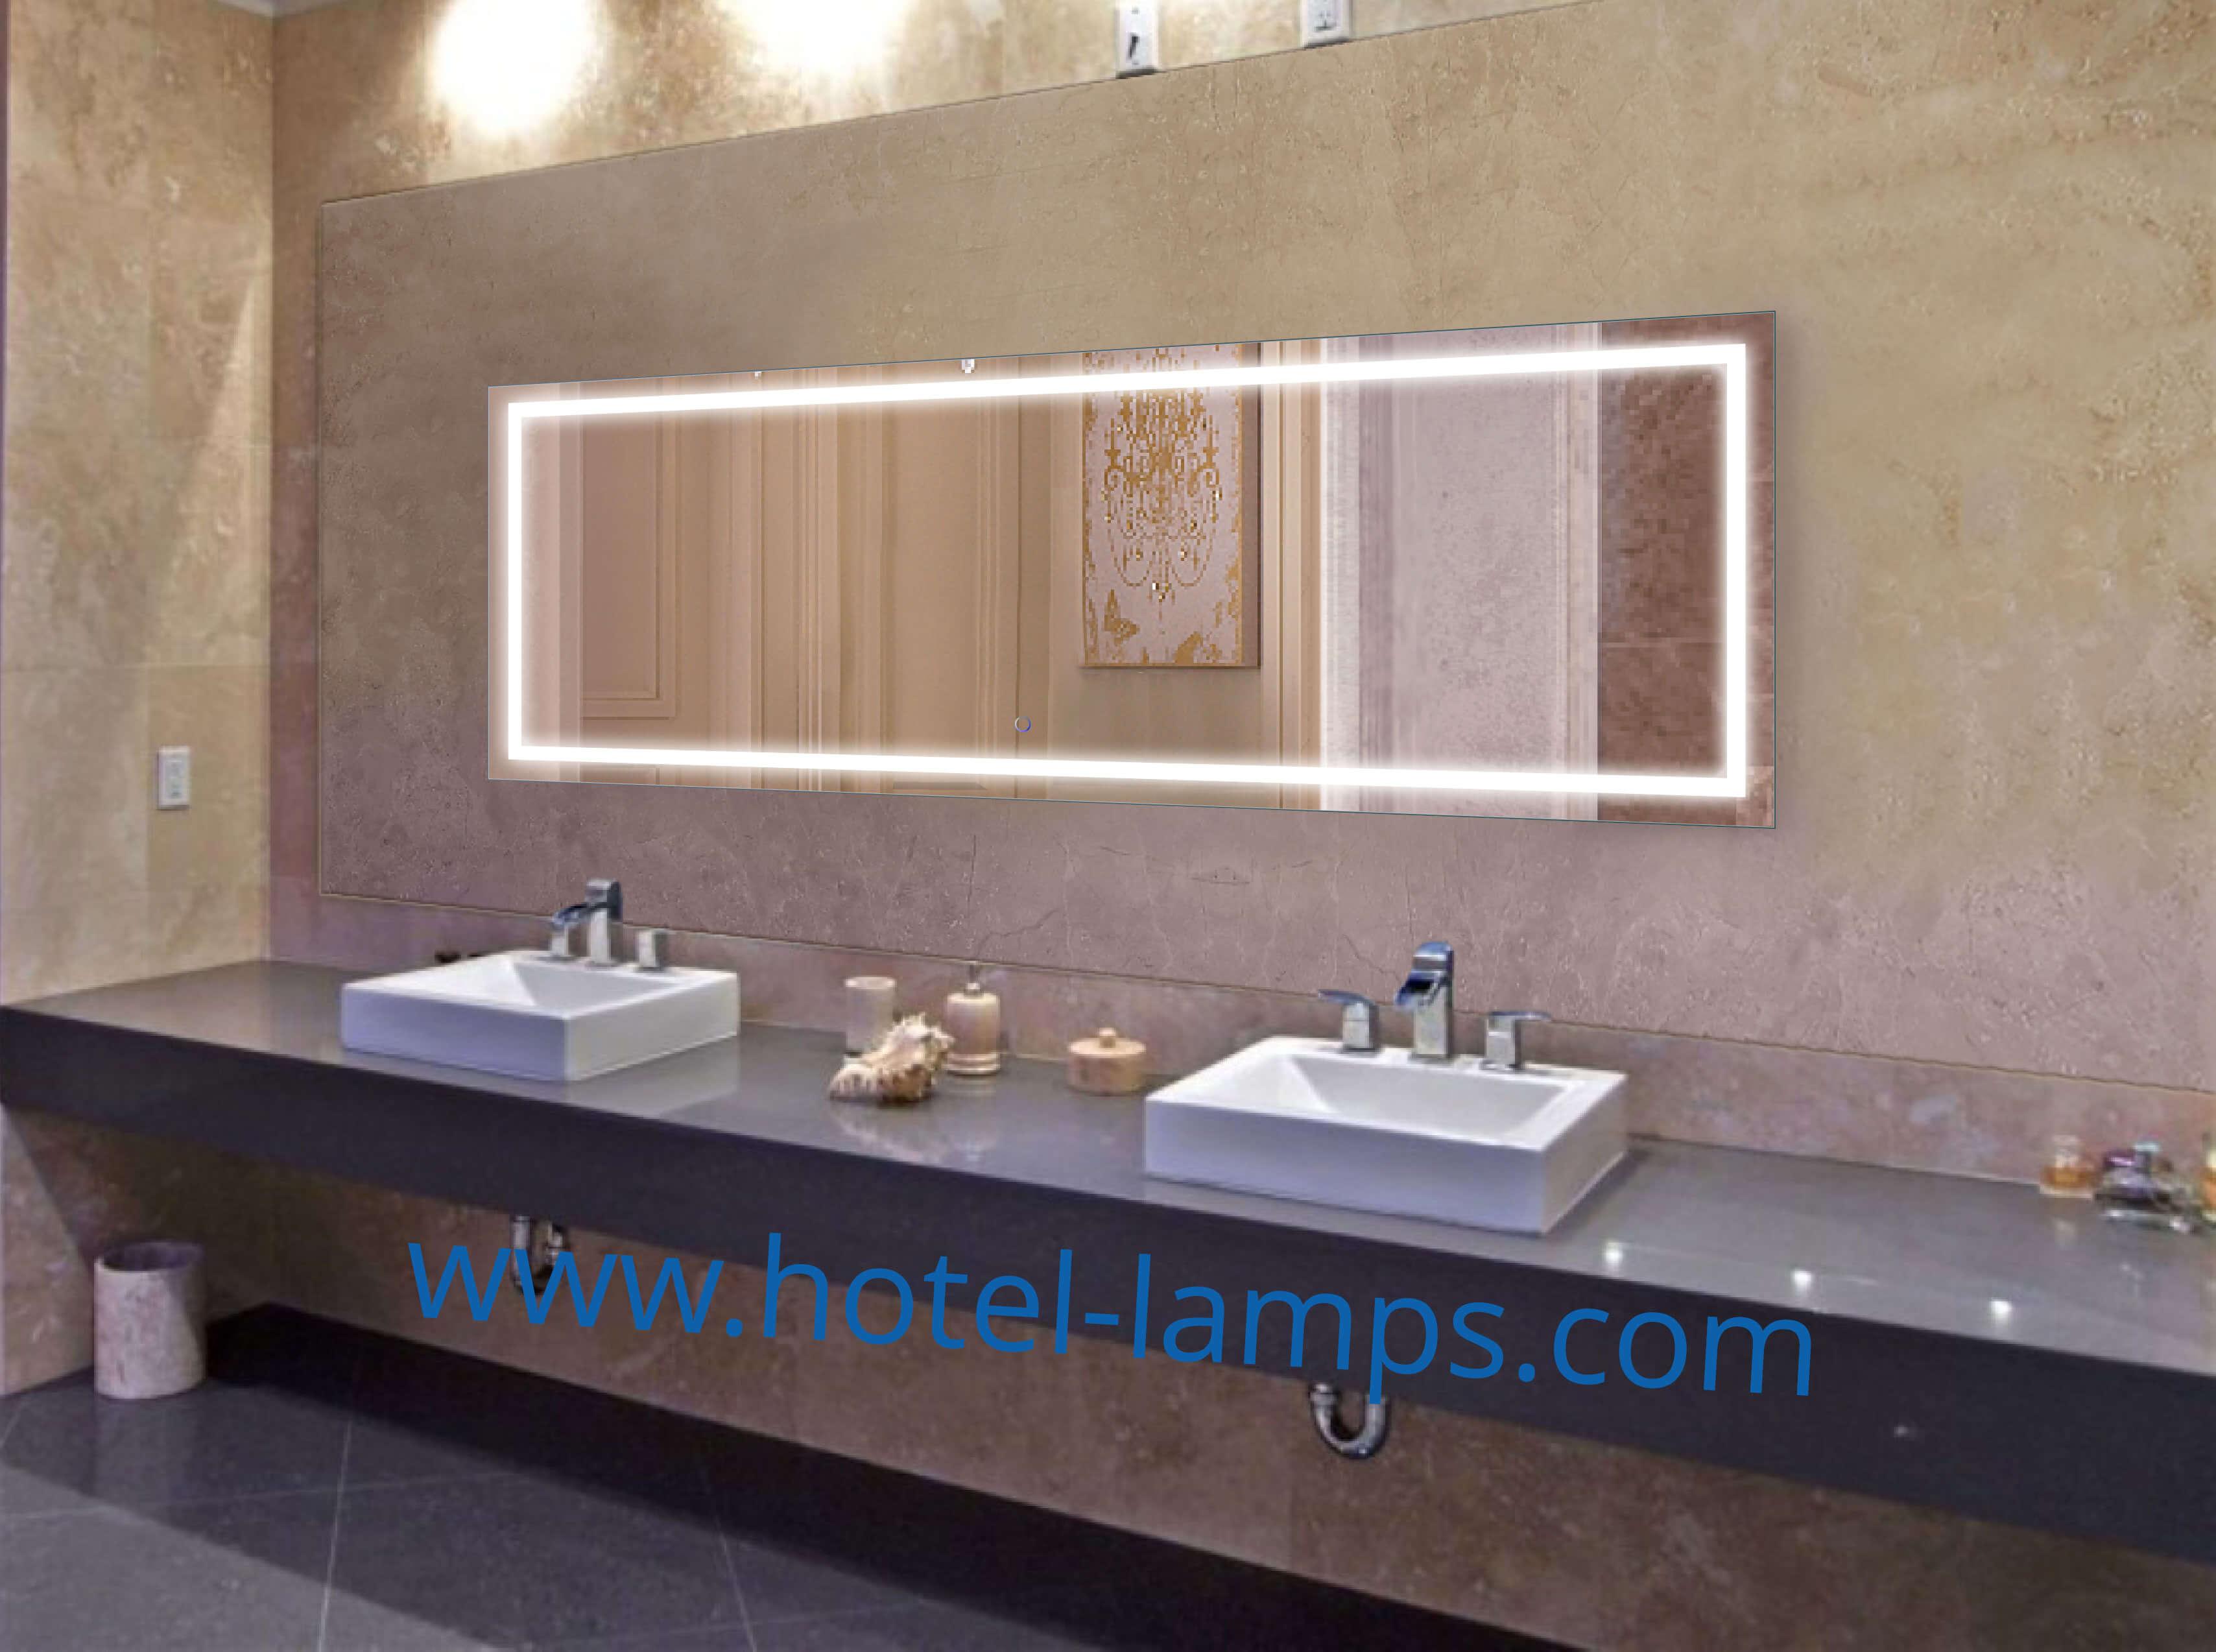 LED Mirror - Rectangle